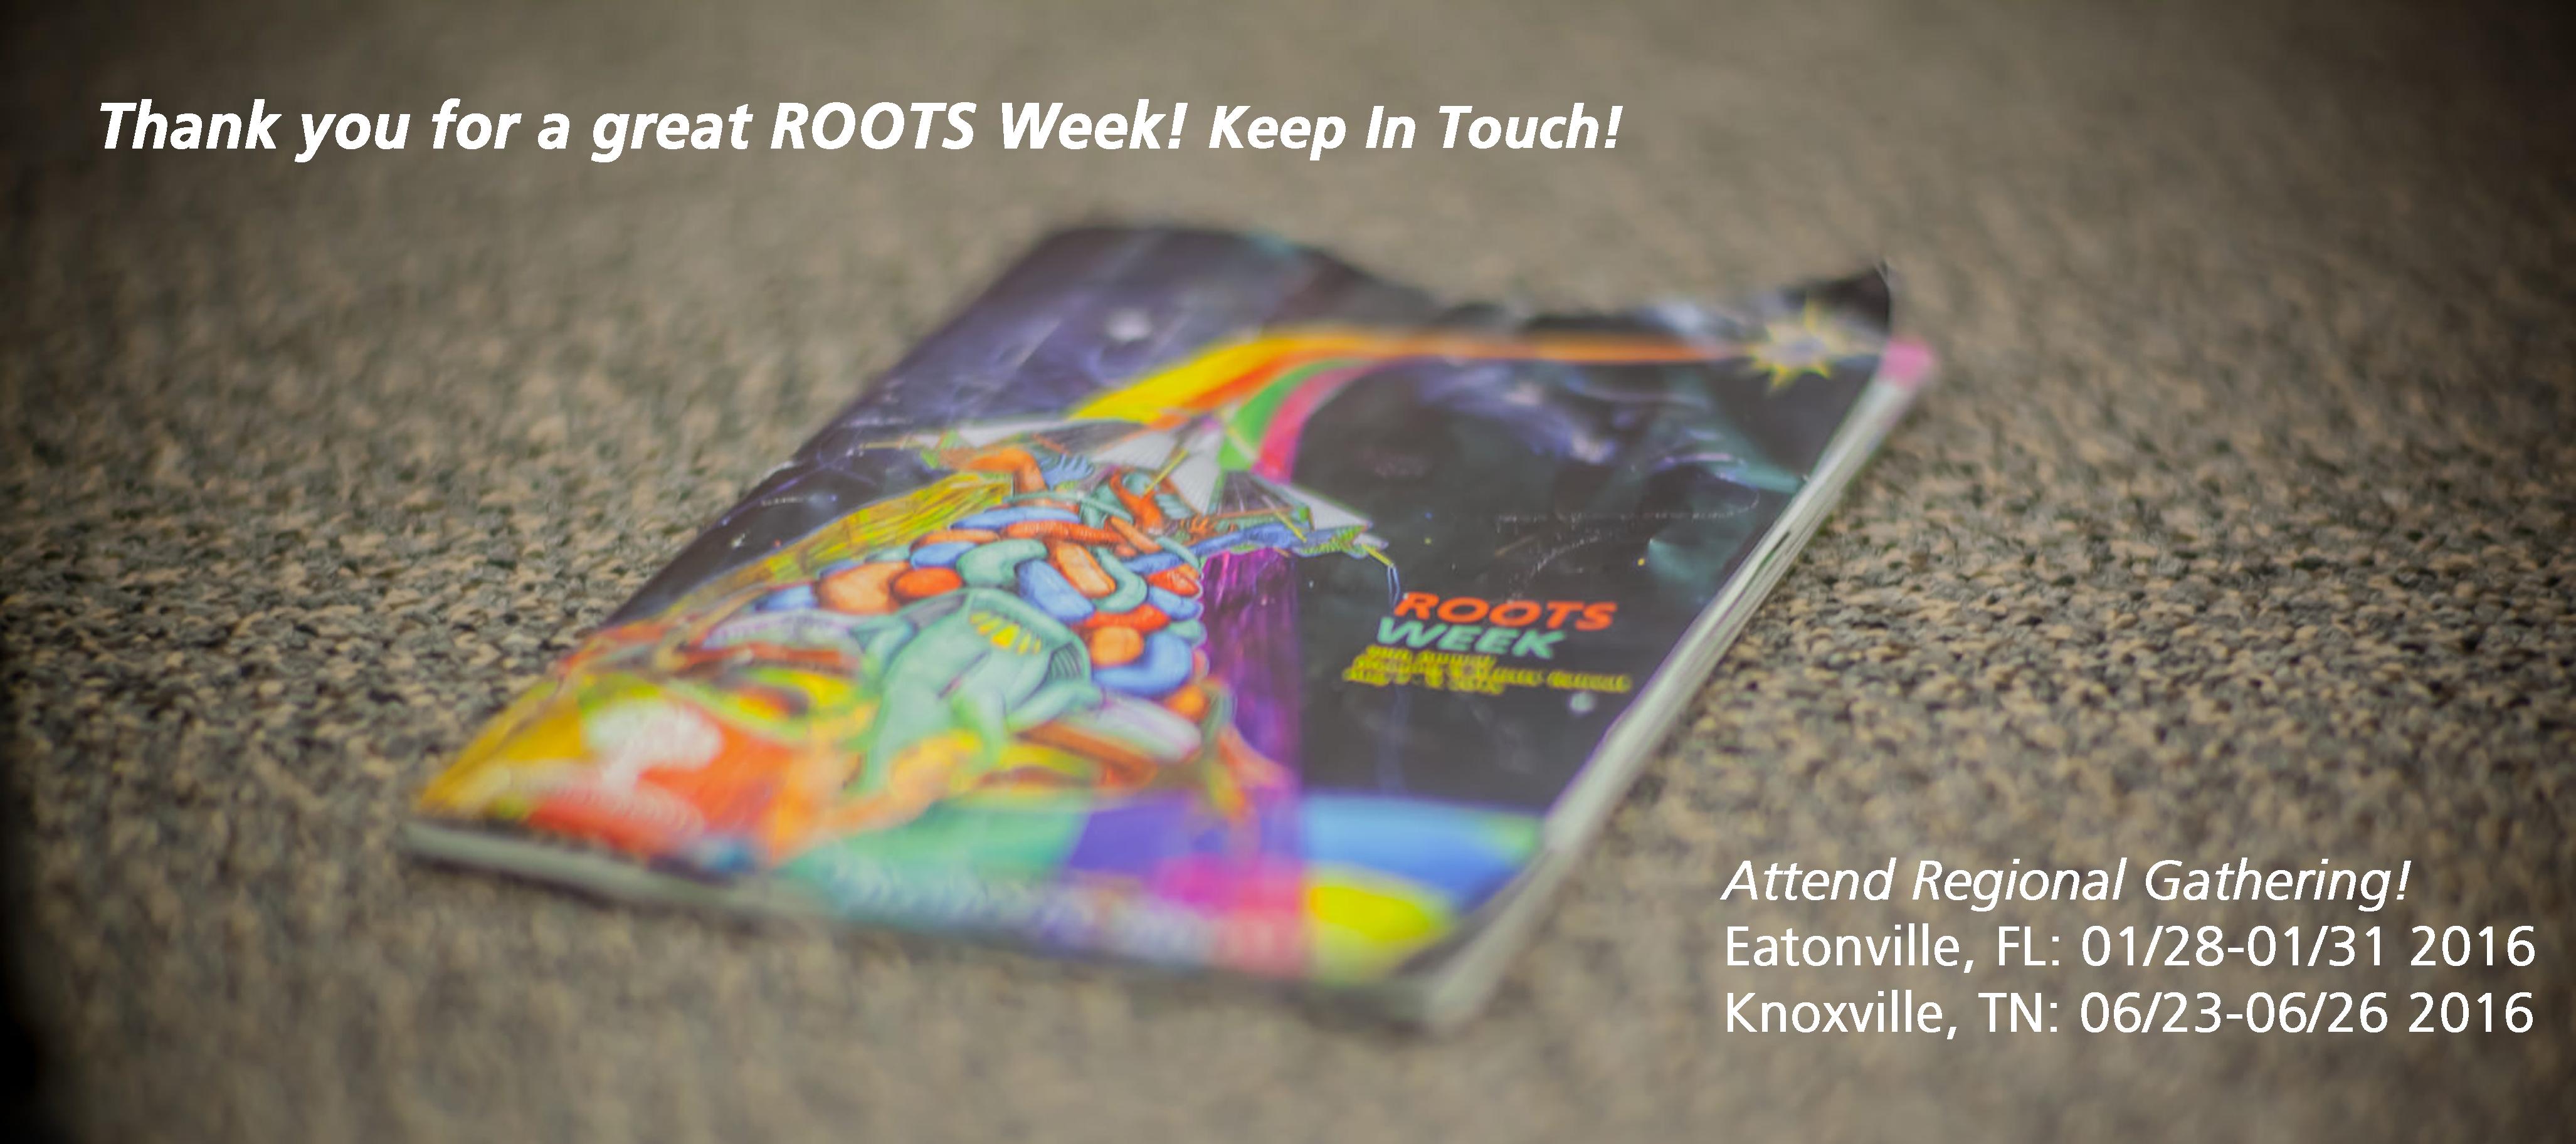 ROOTS Week 2015